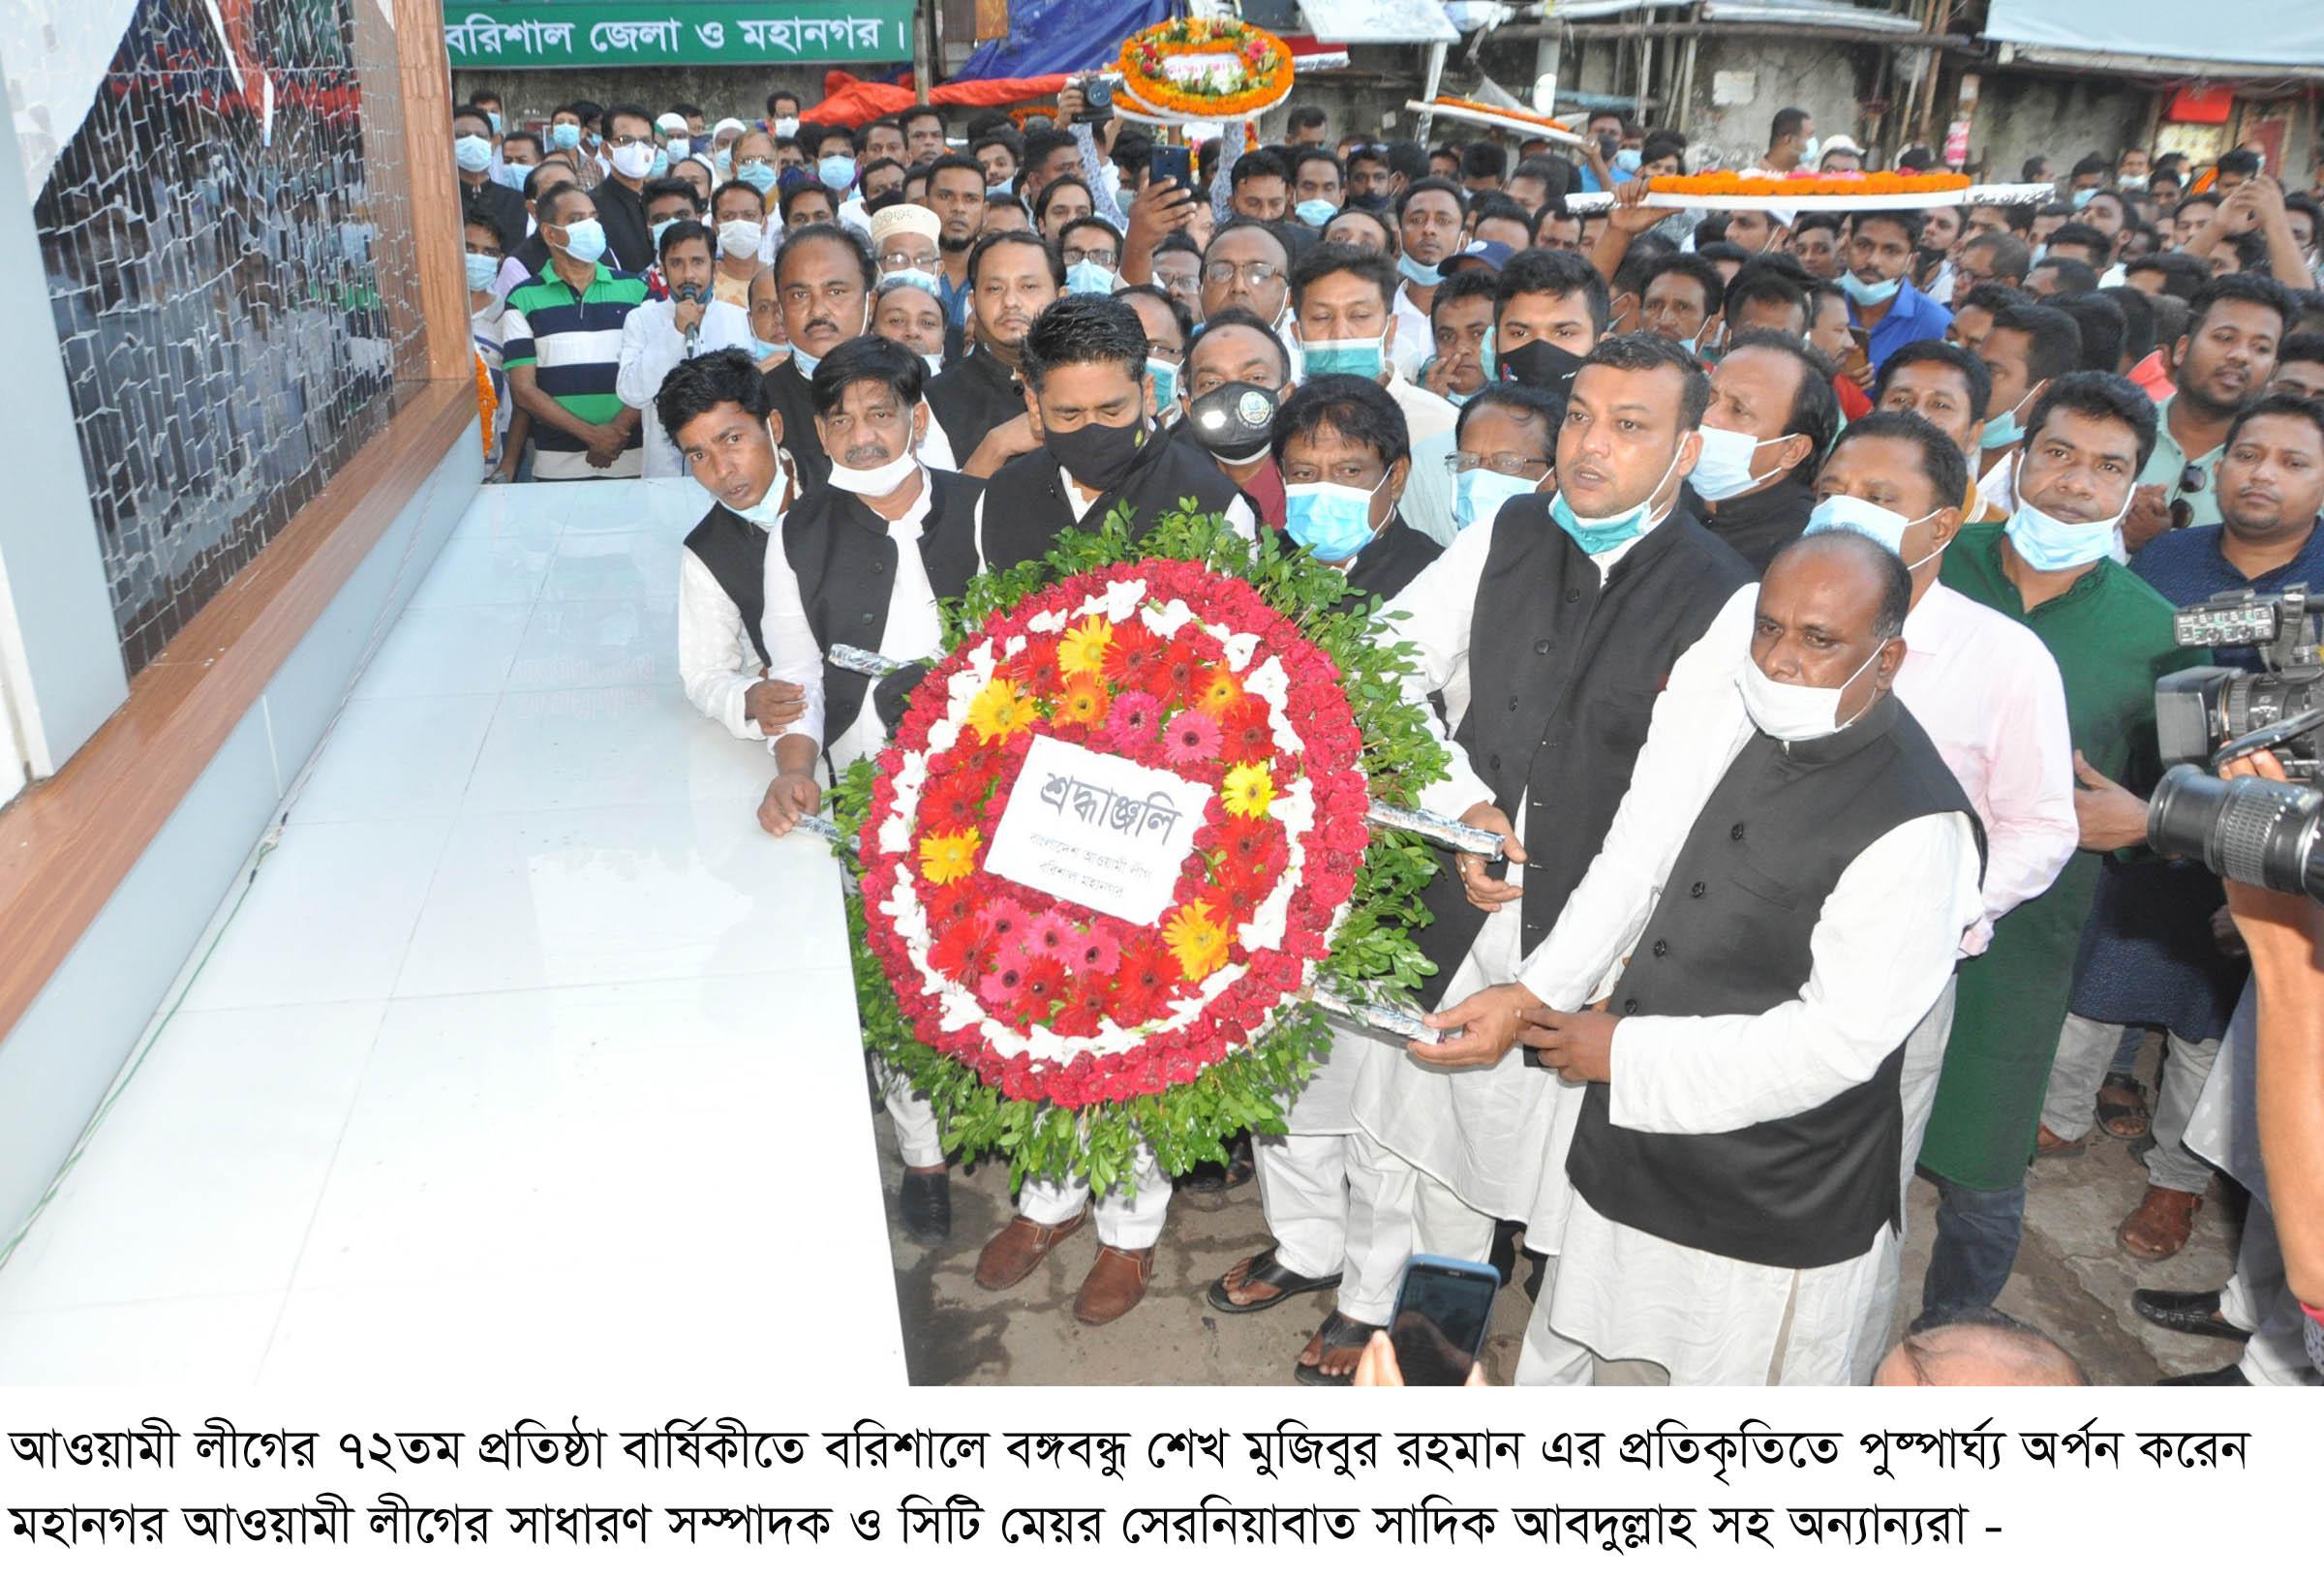 Photo of একযোগে বরিশাল নগরীর ৭২ স্থানে আঁতশবাজী প্রদর্শন